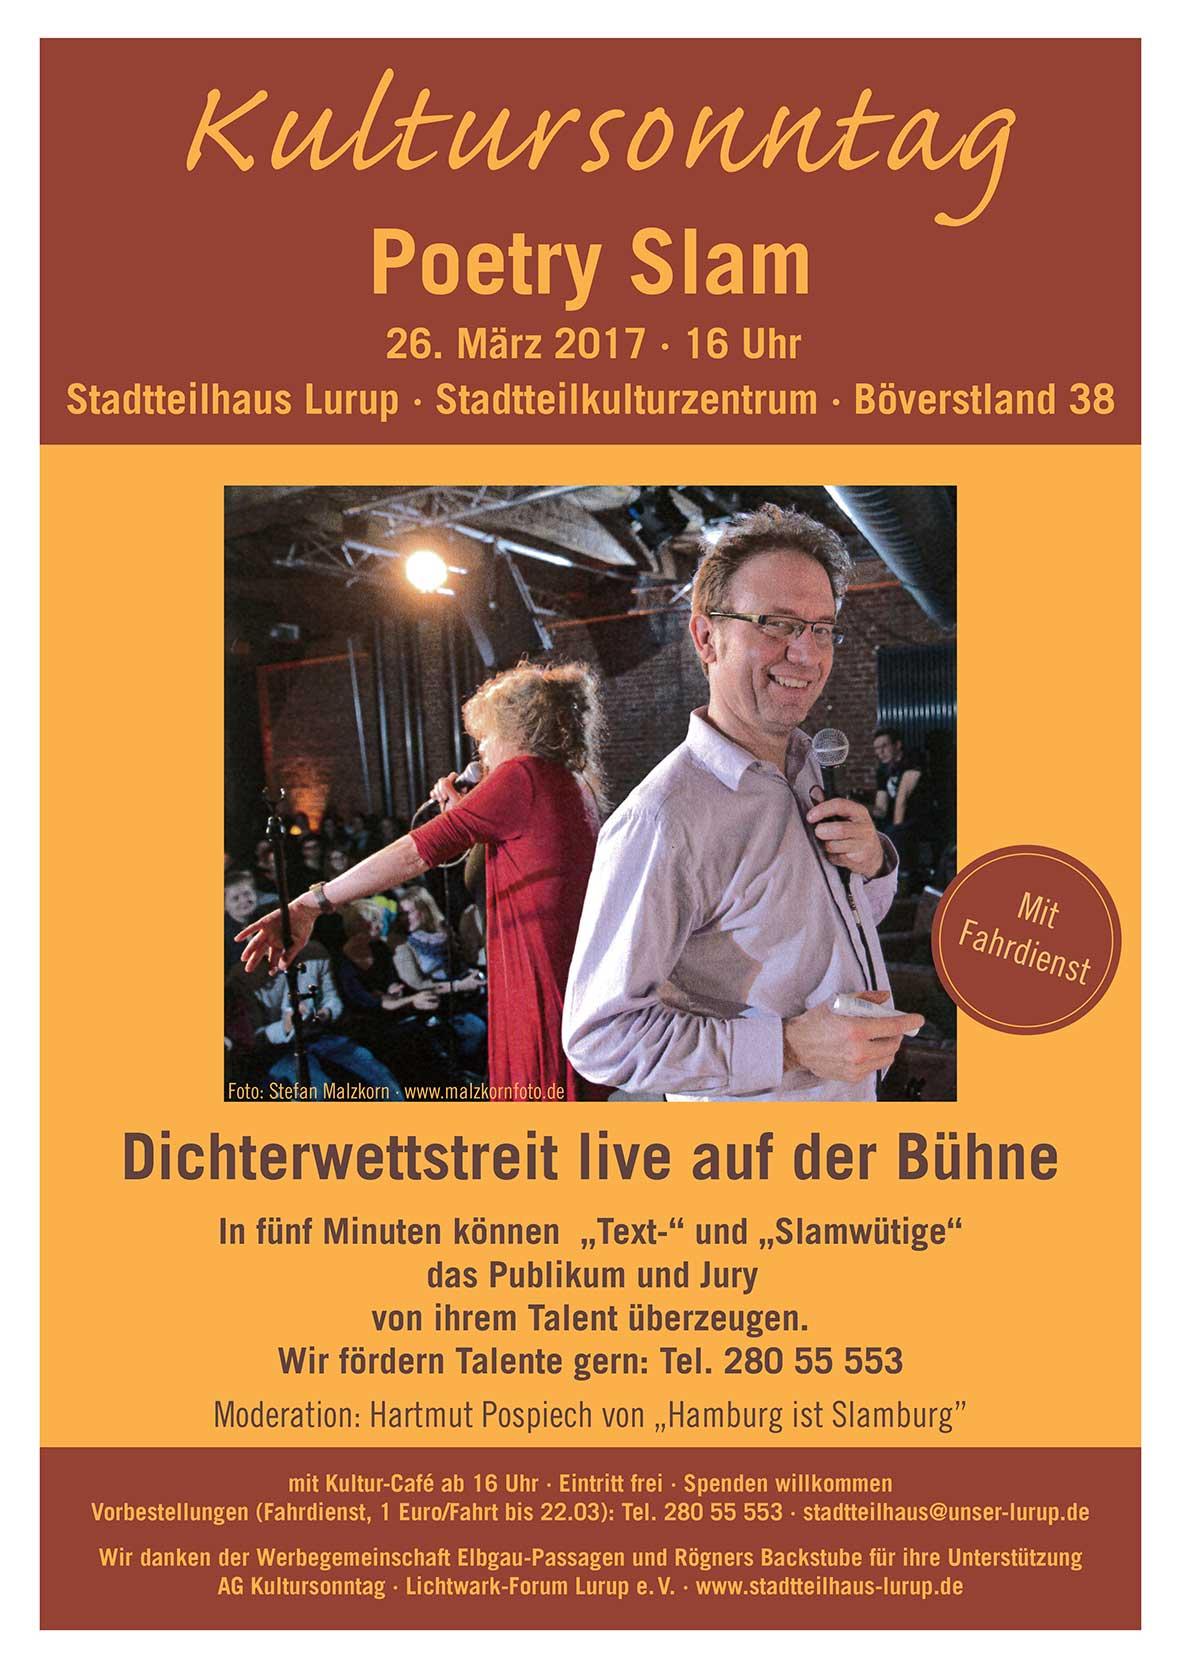 plakat-Poetry-slam-2017web2